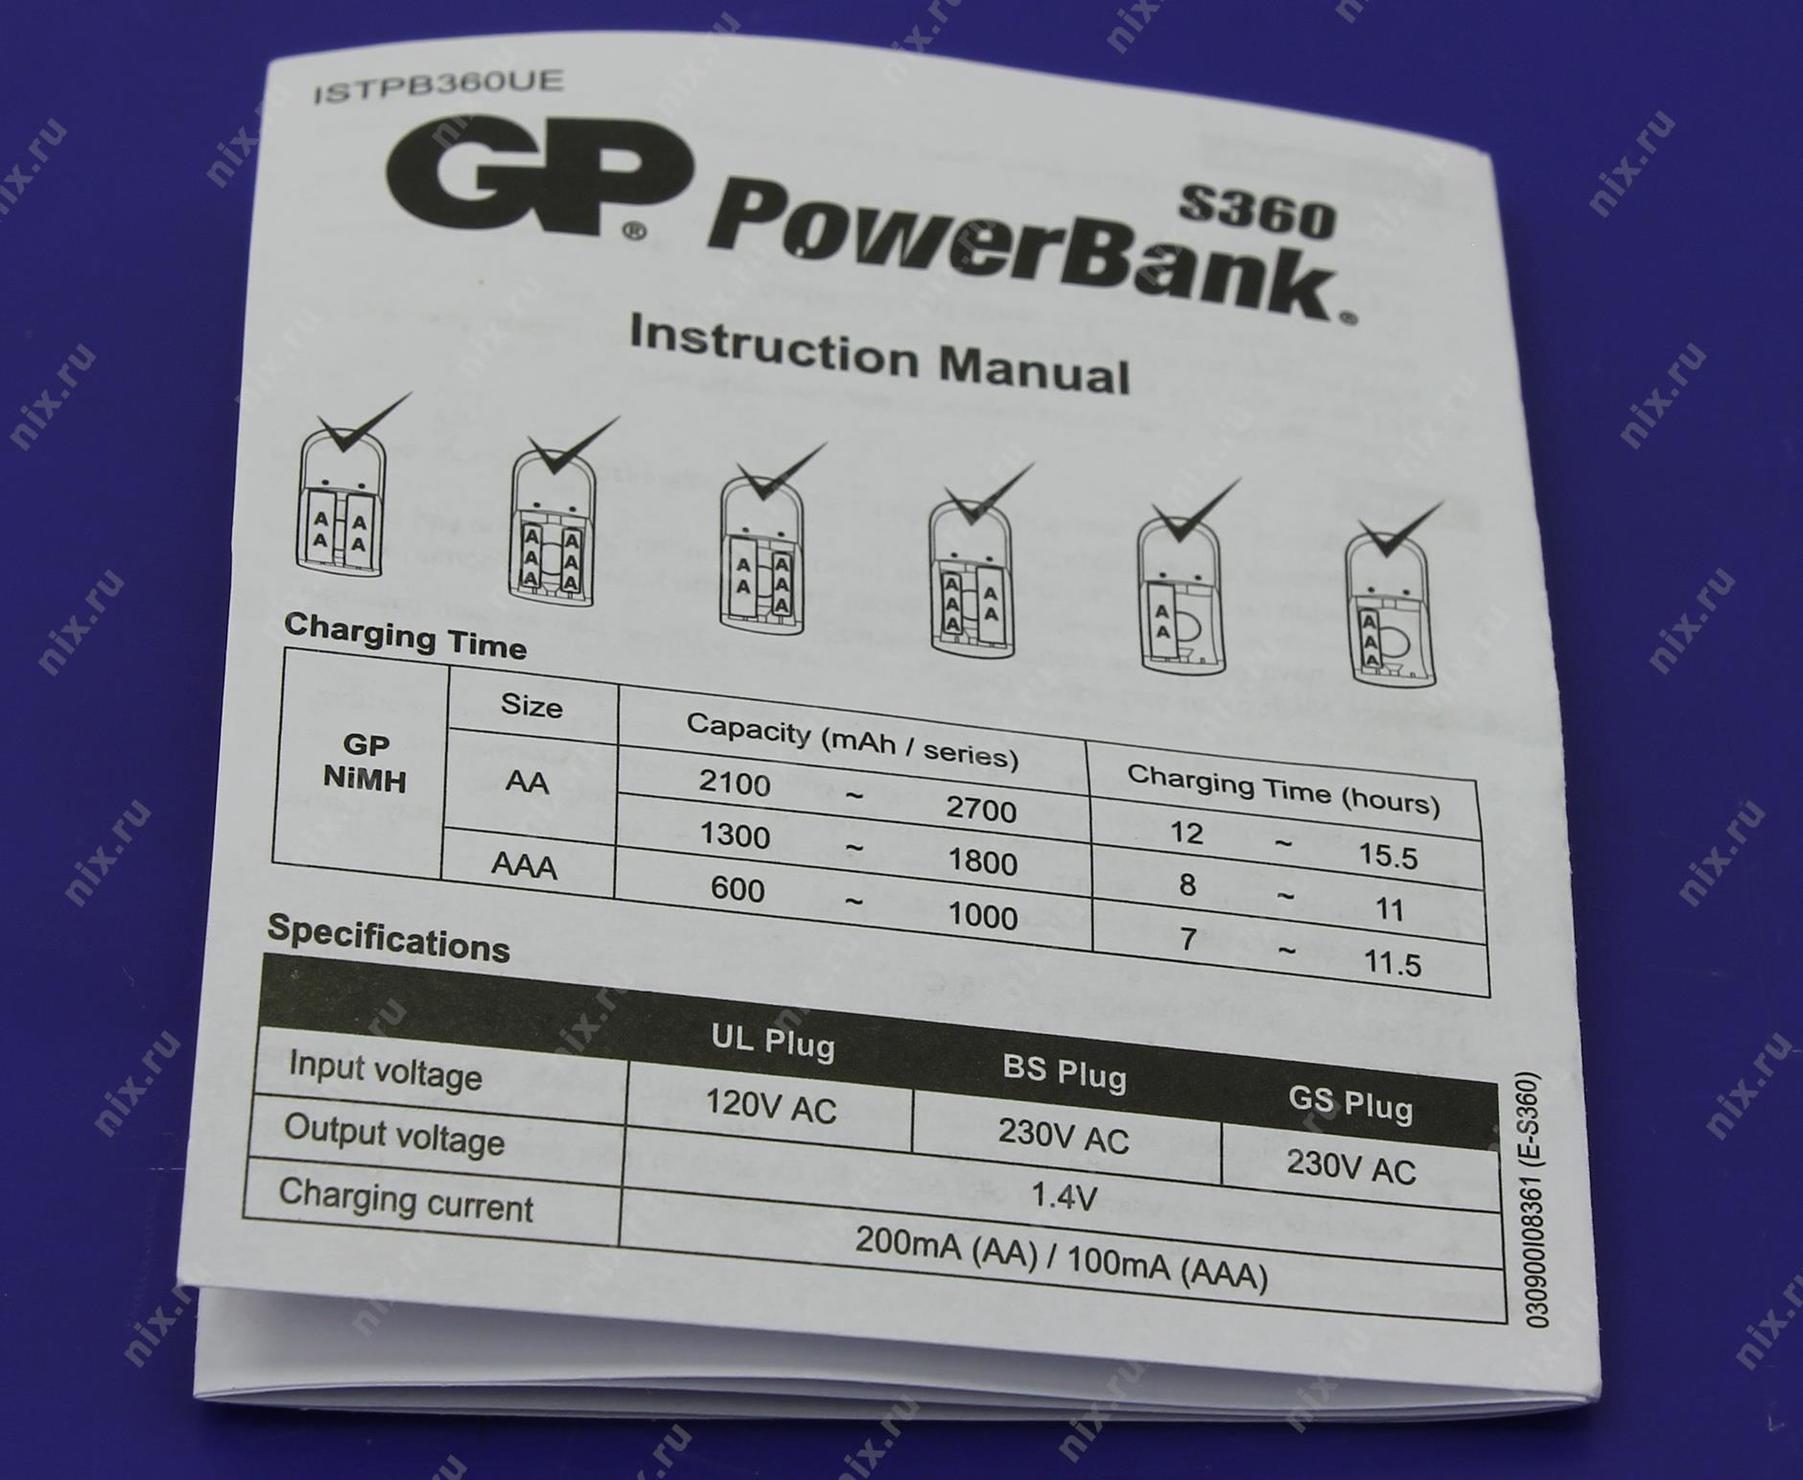 зарядное устройство gp powerbank s360 инструкция